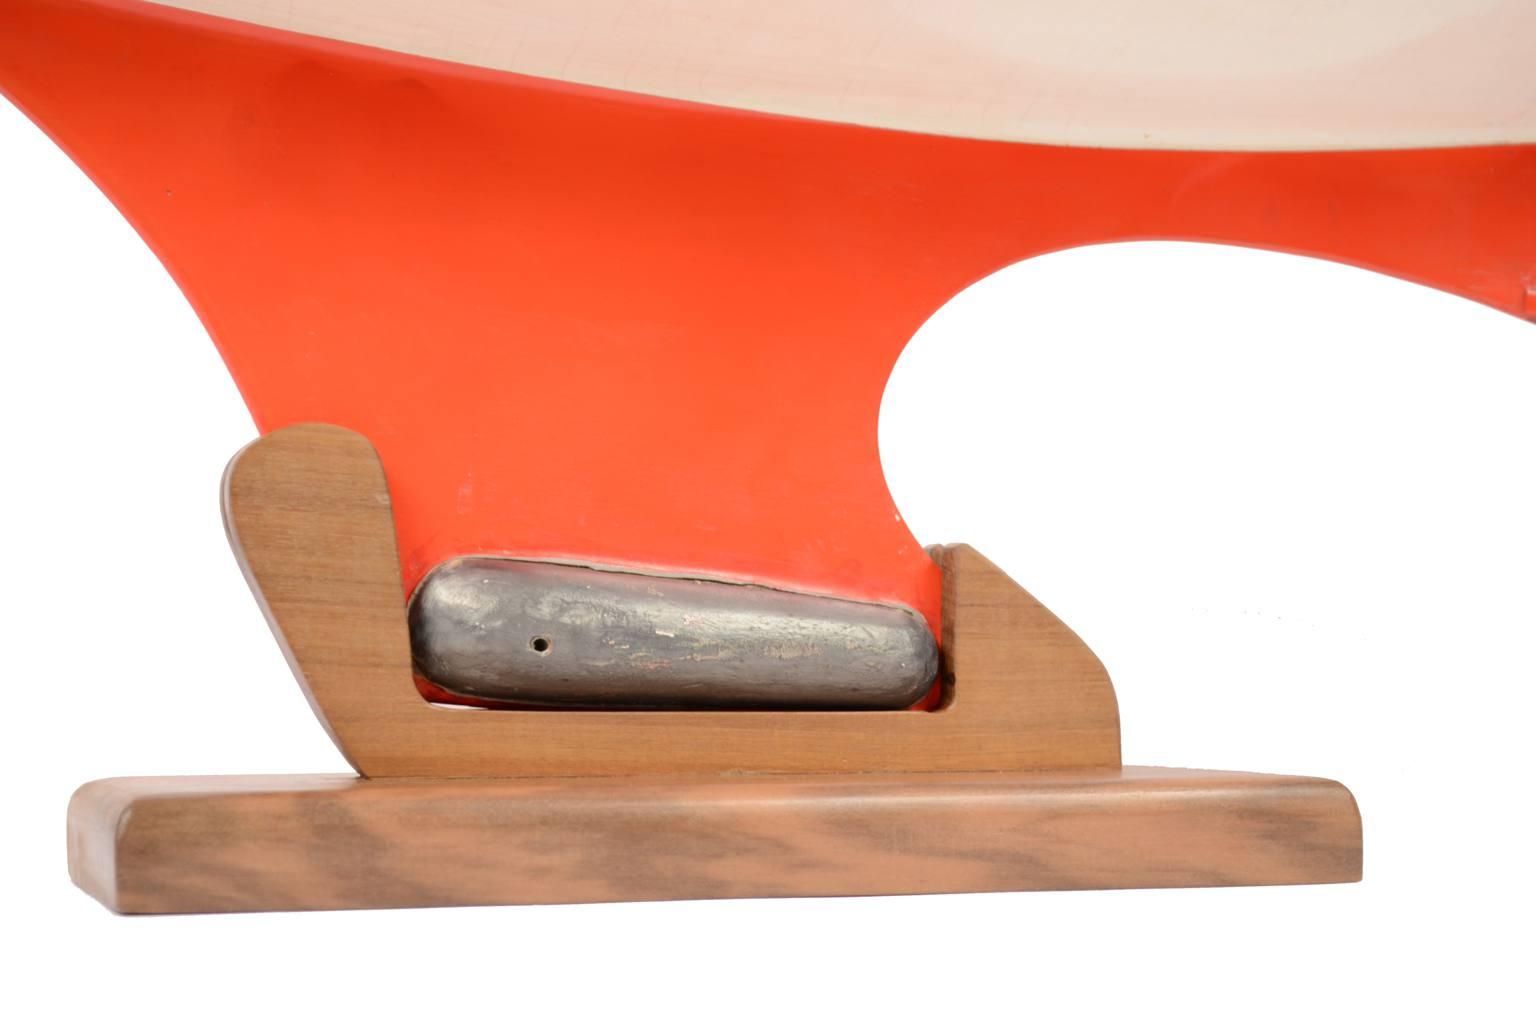 舰船模型/5021B-船模